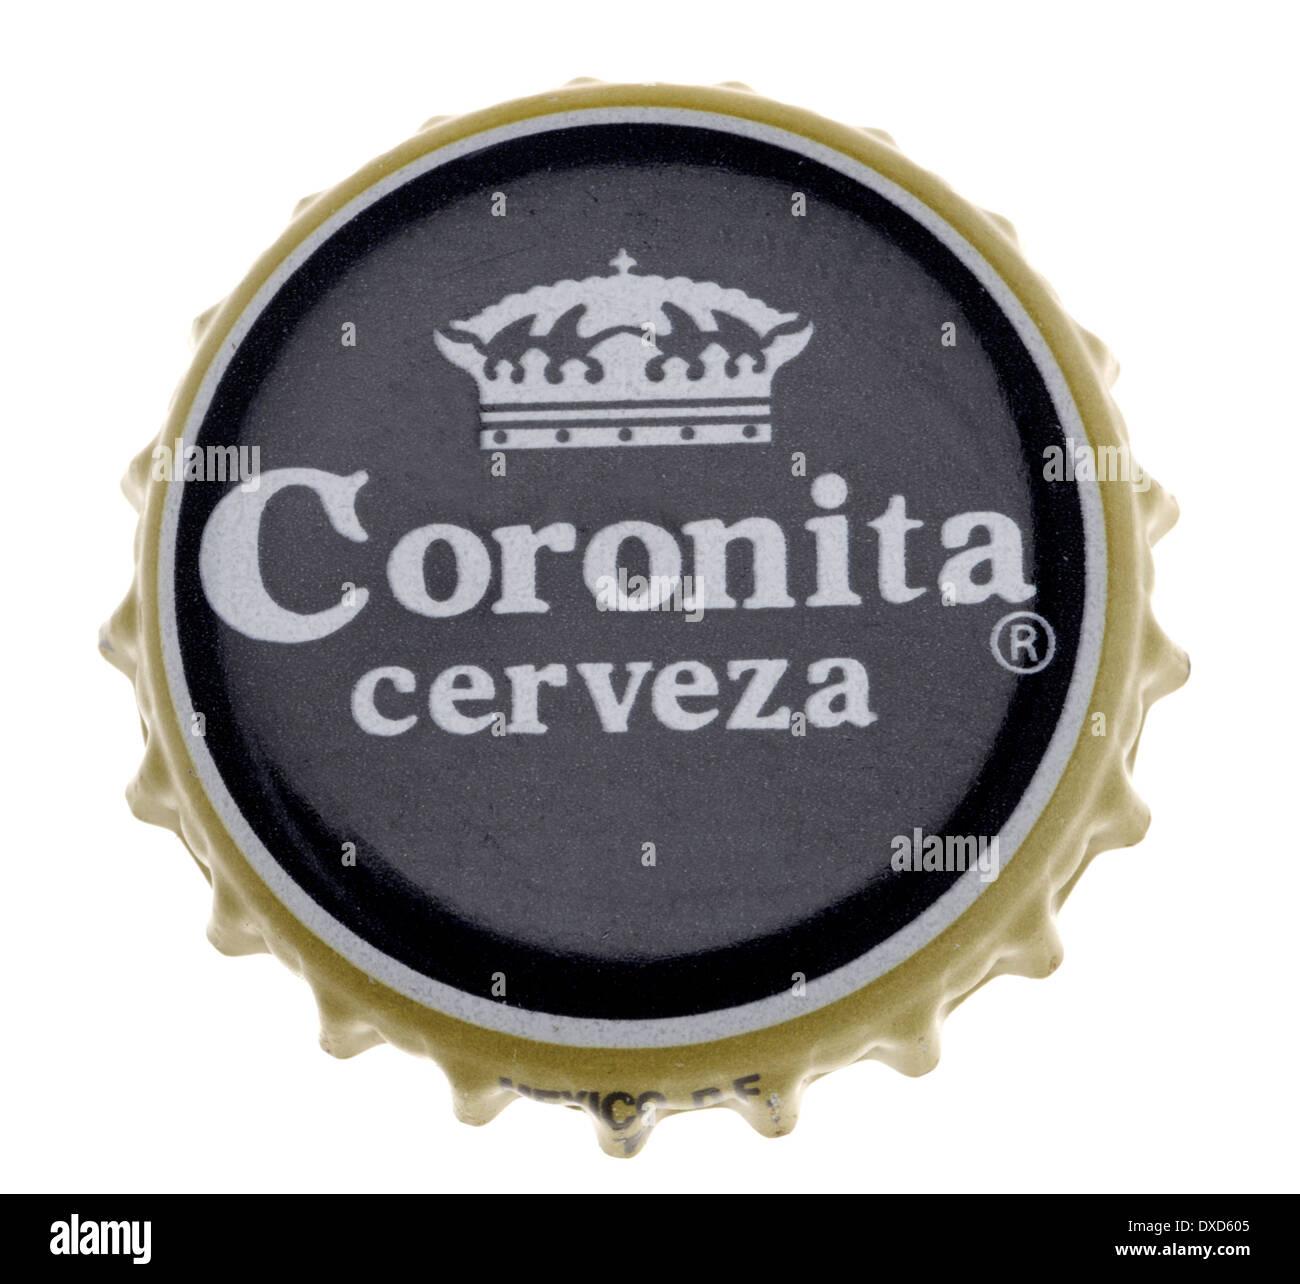 Beer bottle cap - Coronita / Corona (Spain) - Stock Image